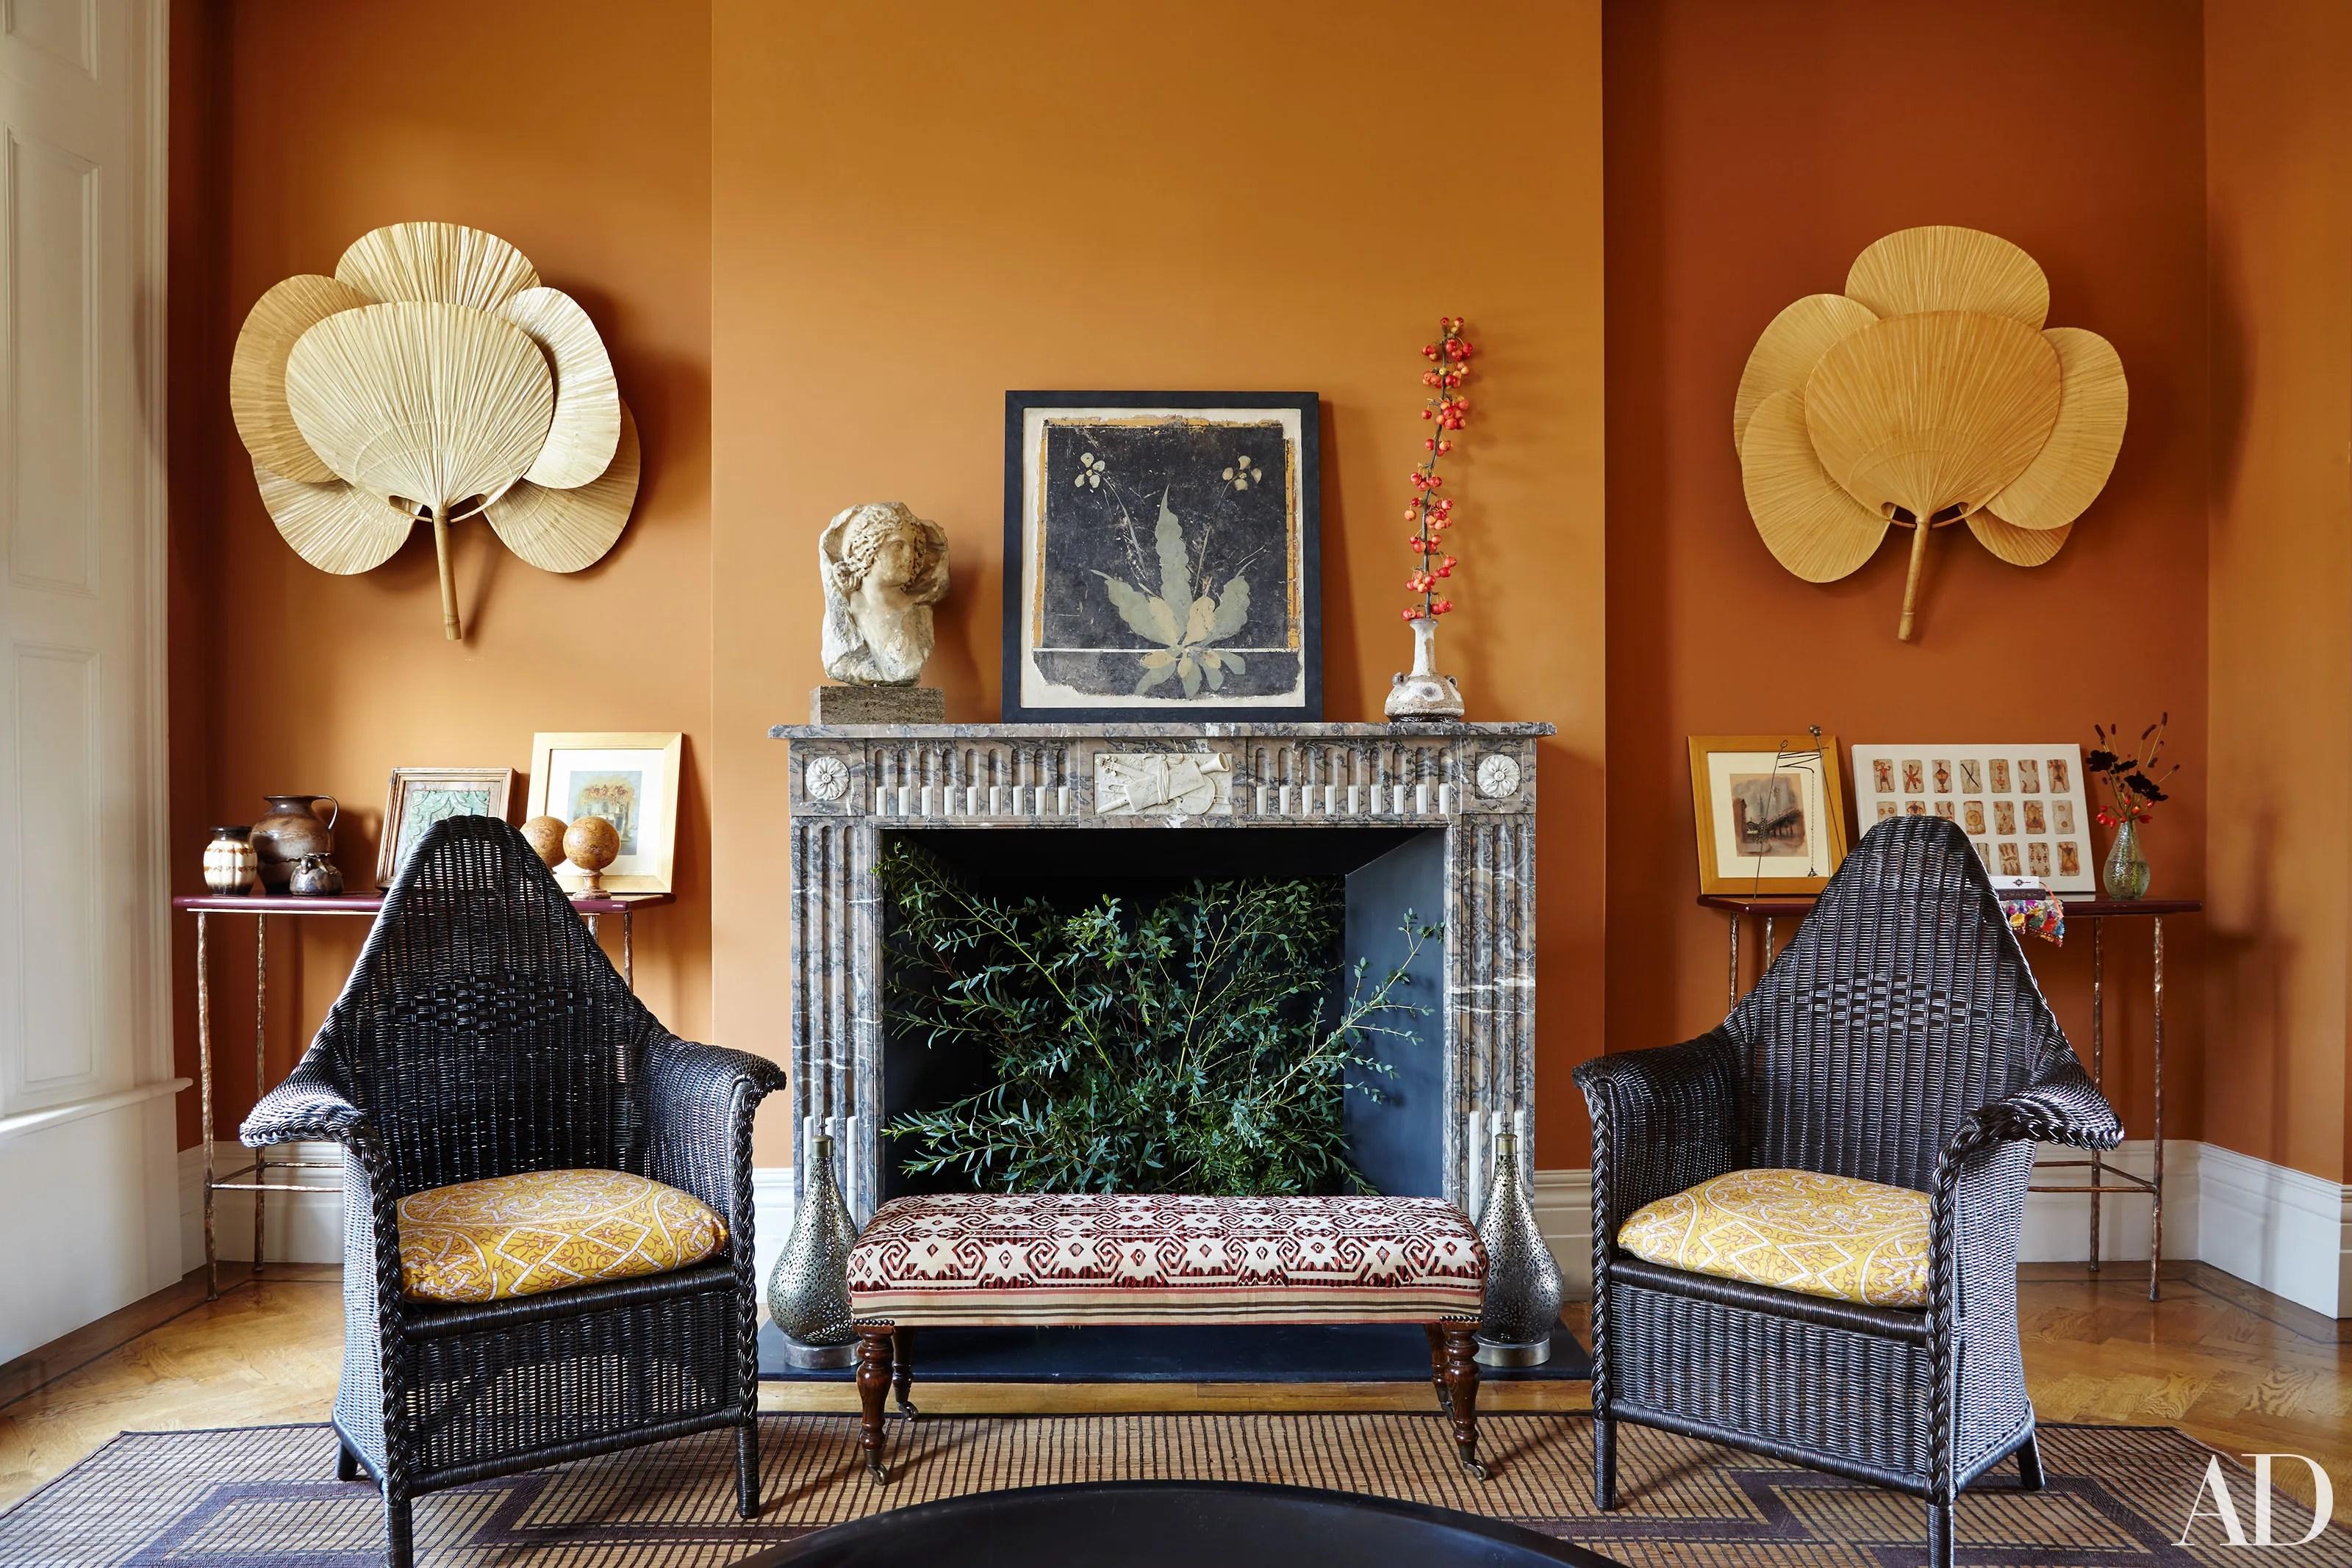 New Year Home Decor Ideas